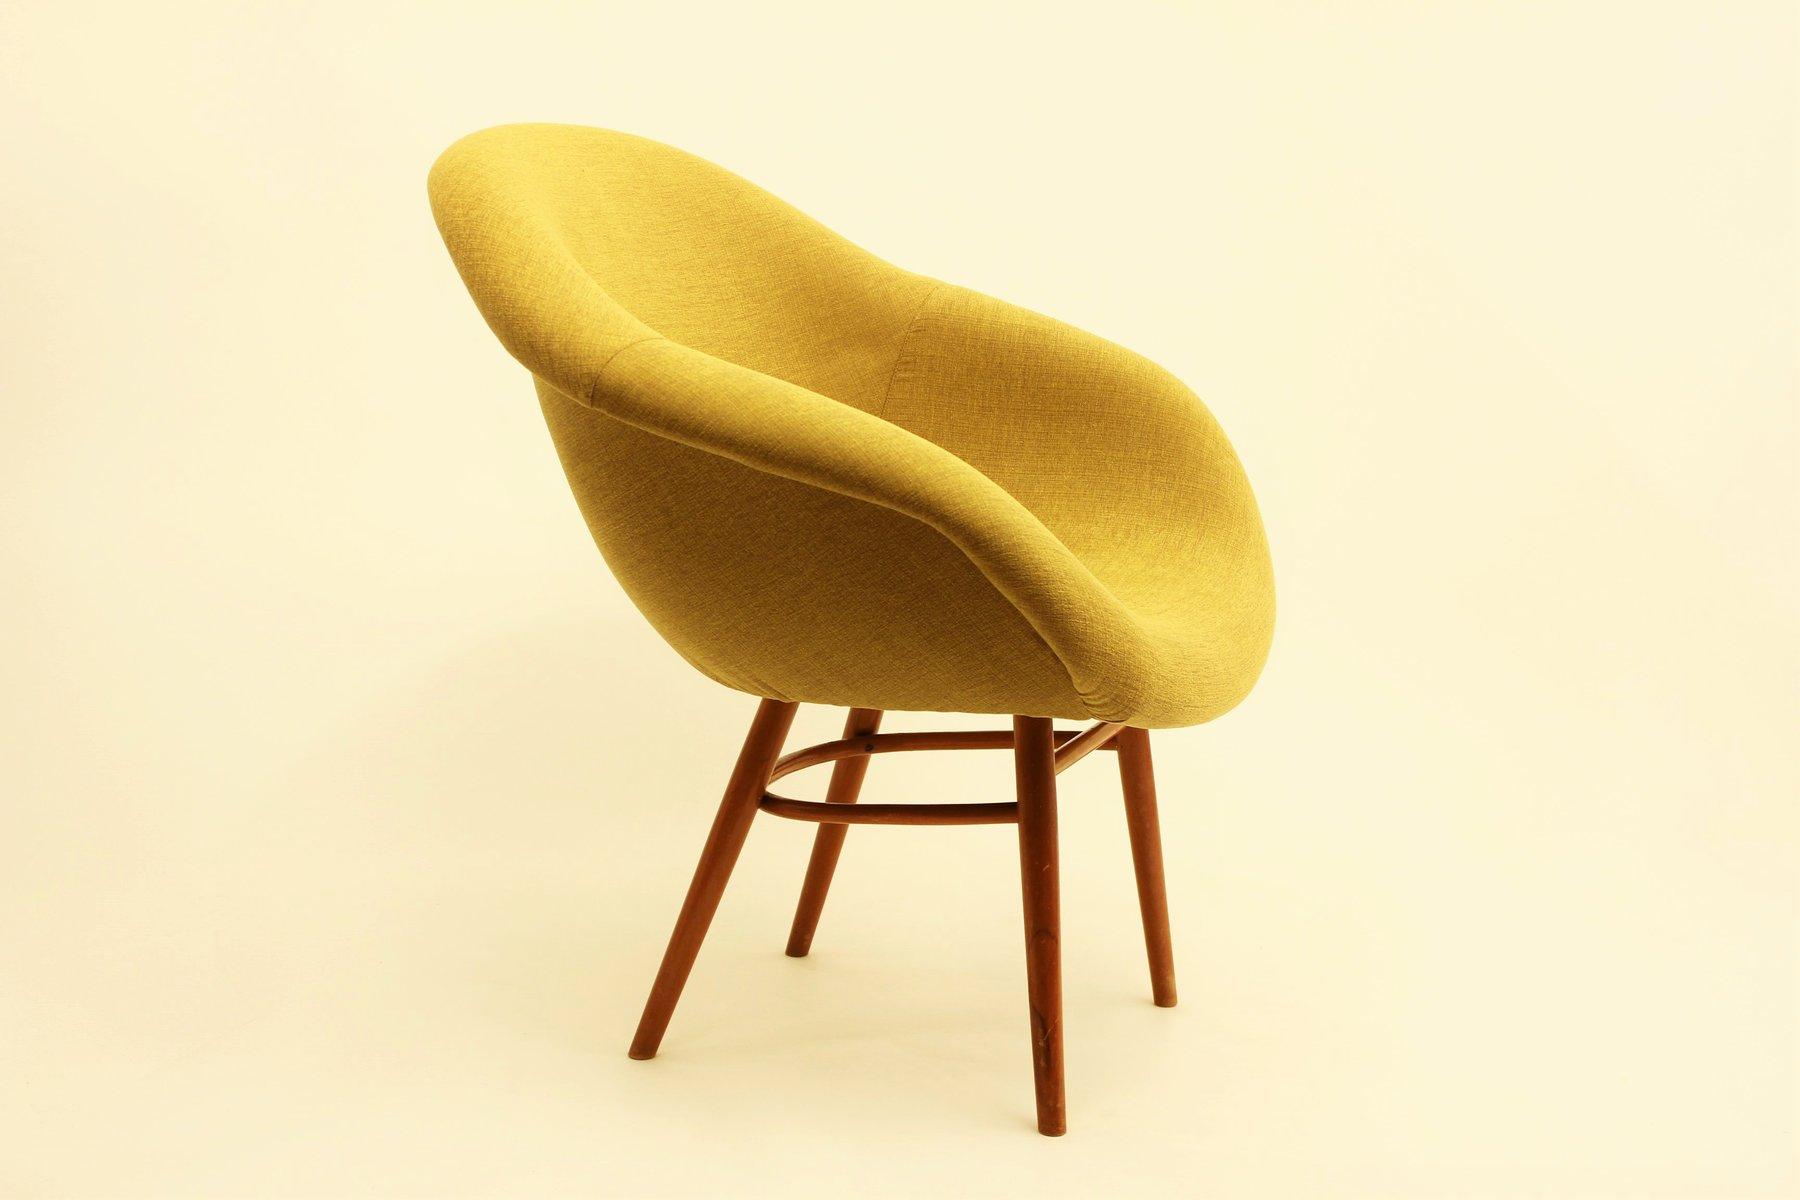 original chair shell eiffel vintage fiberglass side miller dsr ochre dsw oh dowel products eames herman